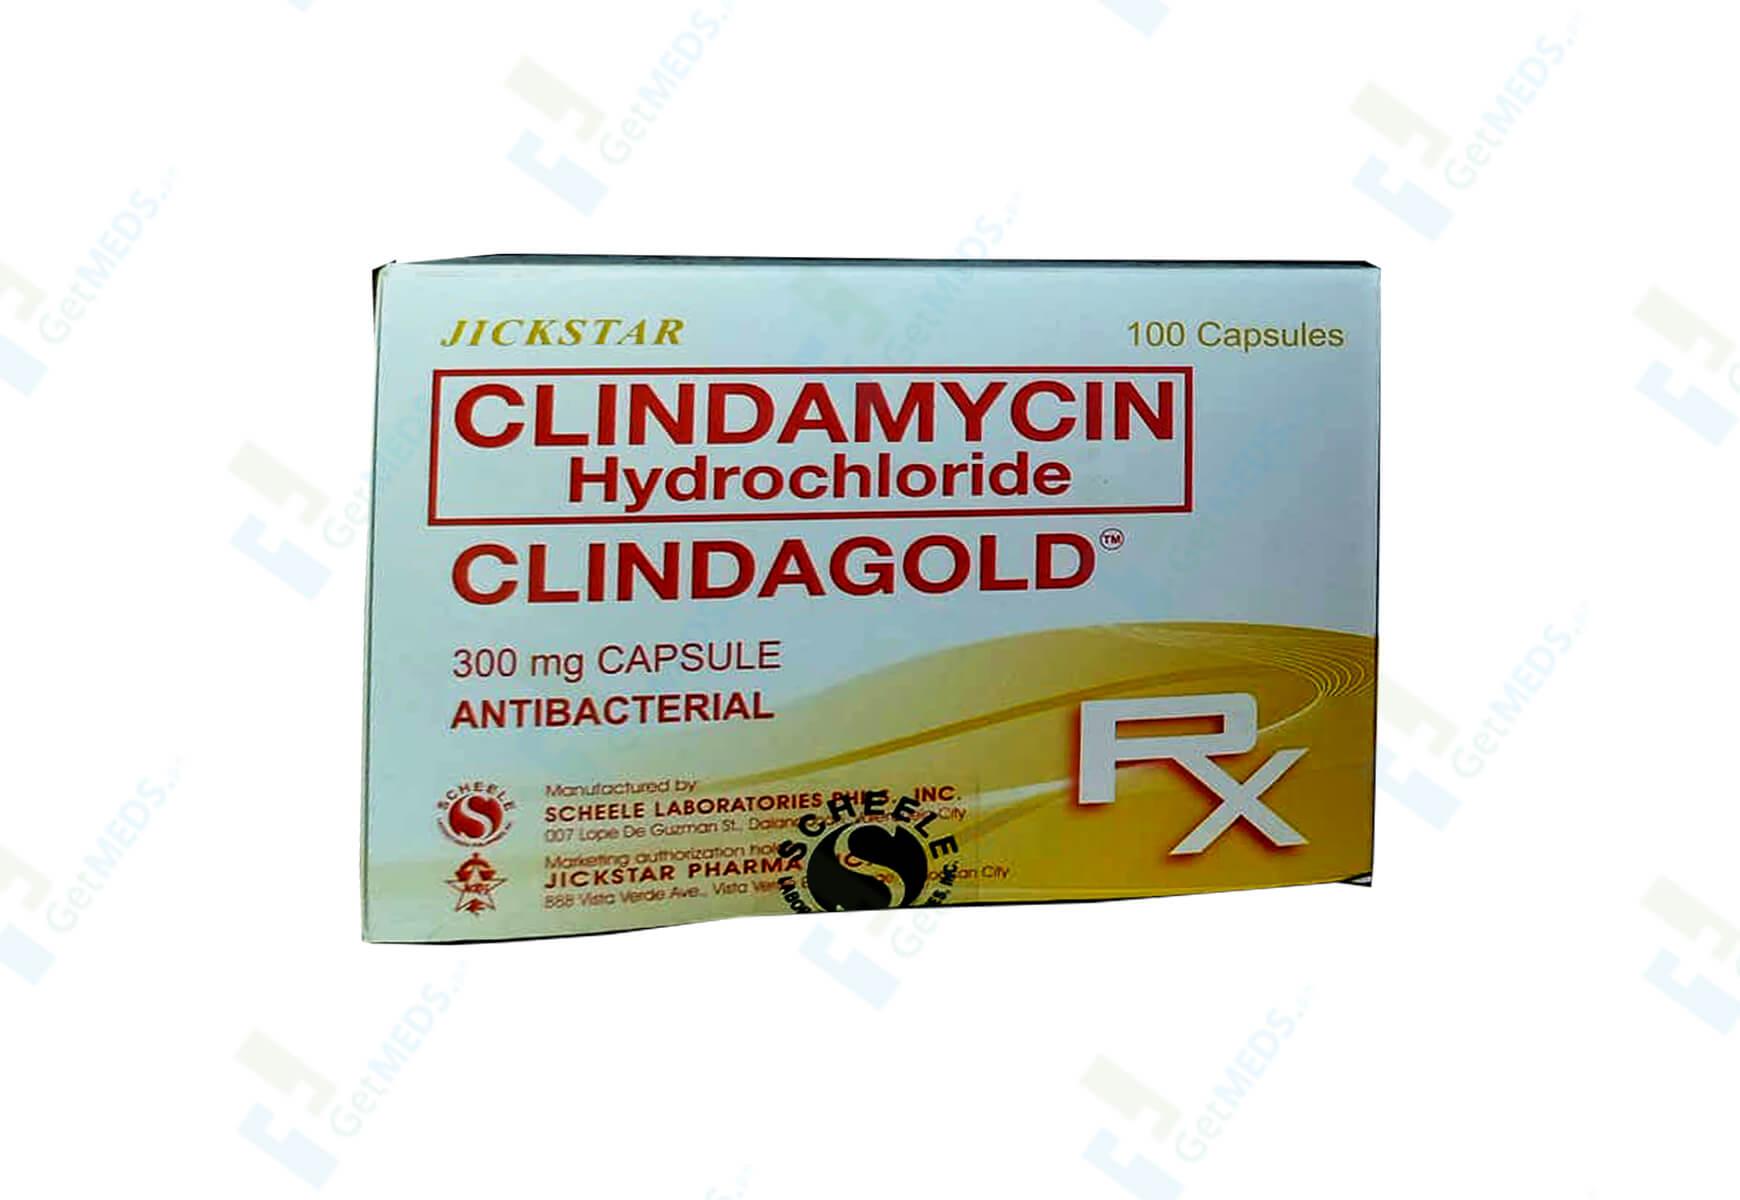 Clindagold